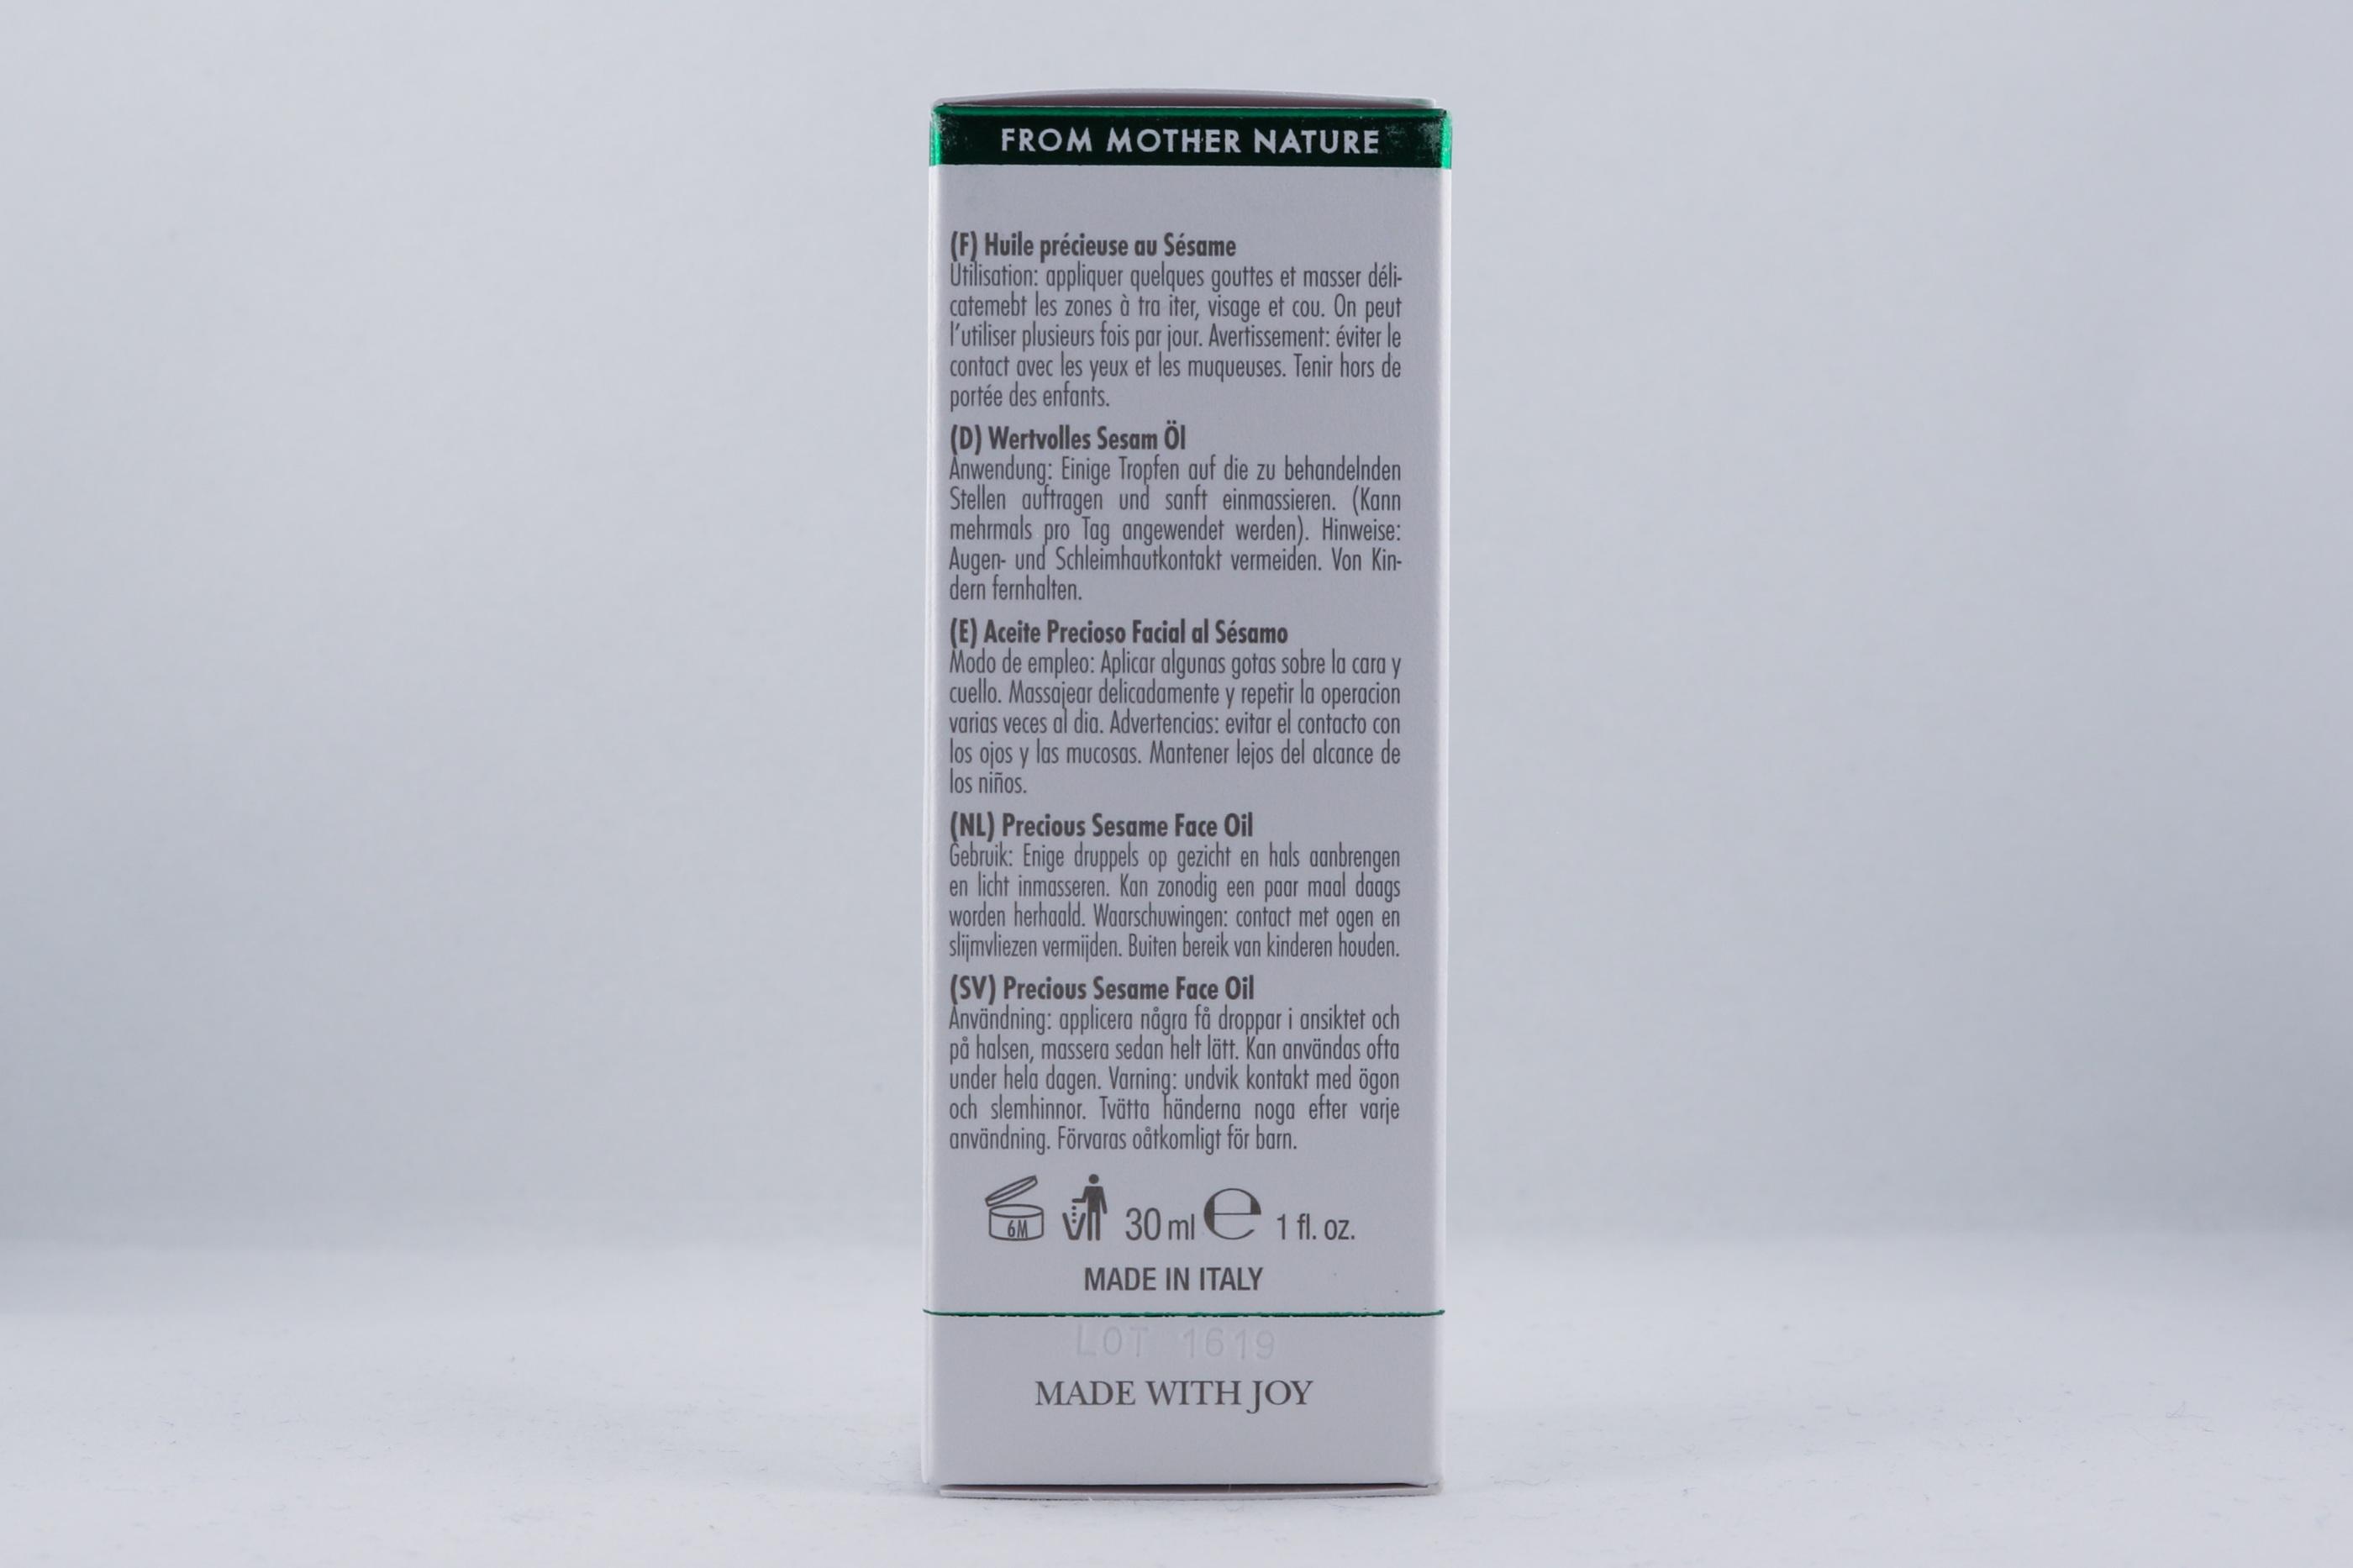 Vata Precious Sesame Face Oil hudvårdsprodukt hudvårdstyp alternativ hälsa wellness ayurveda hudvård